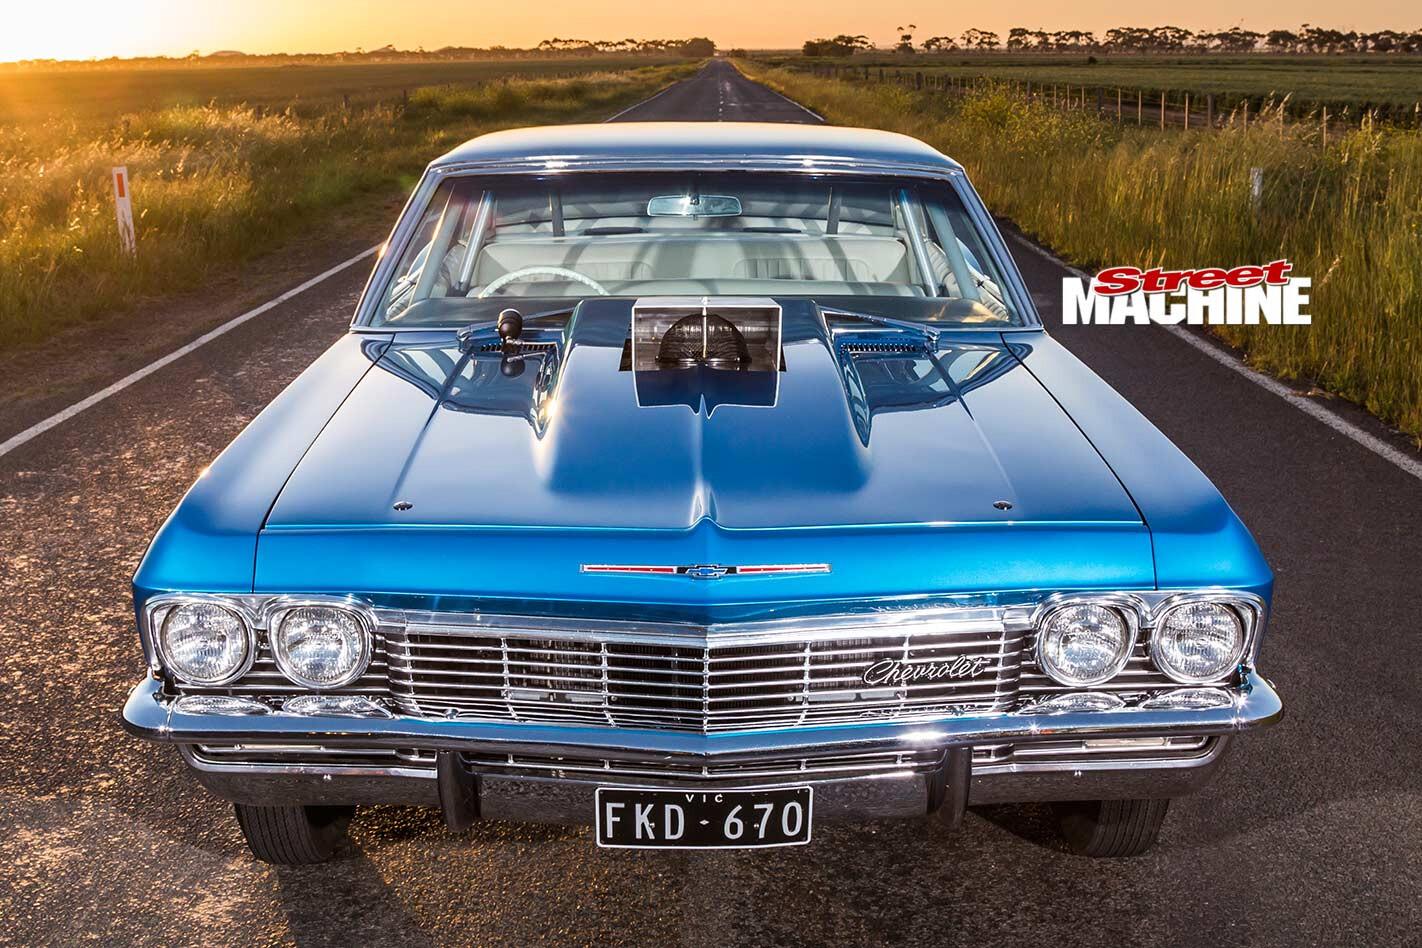 Chev Impala front